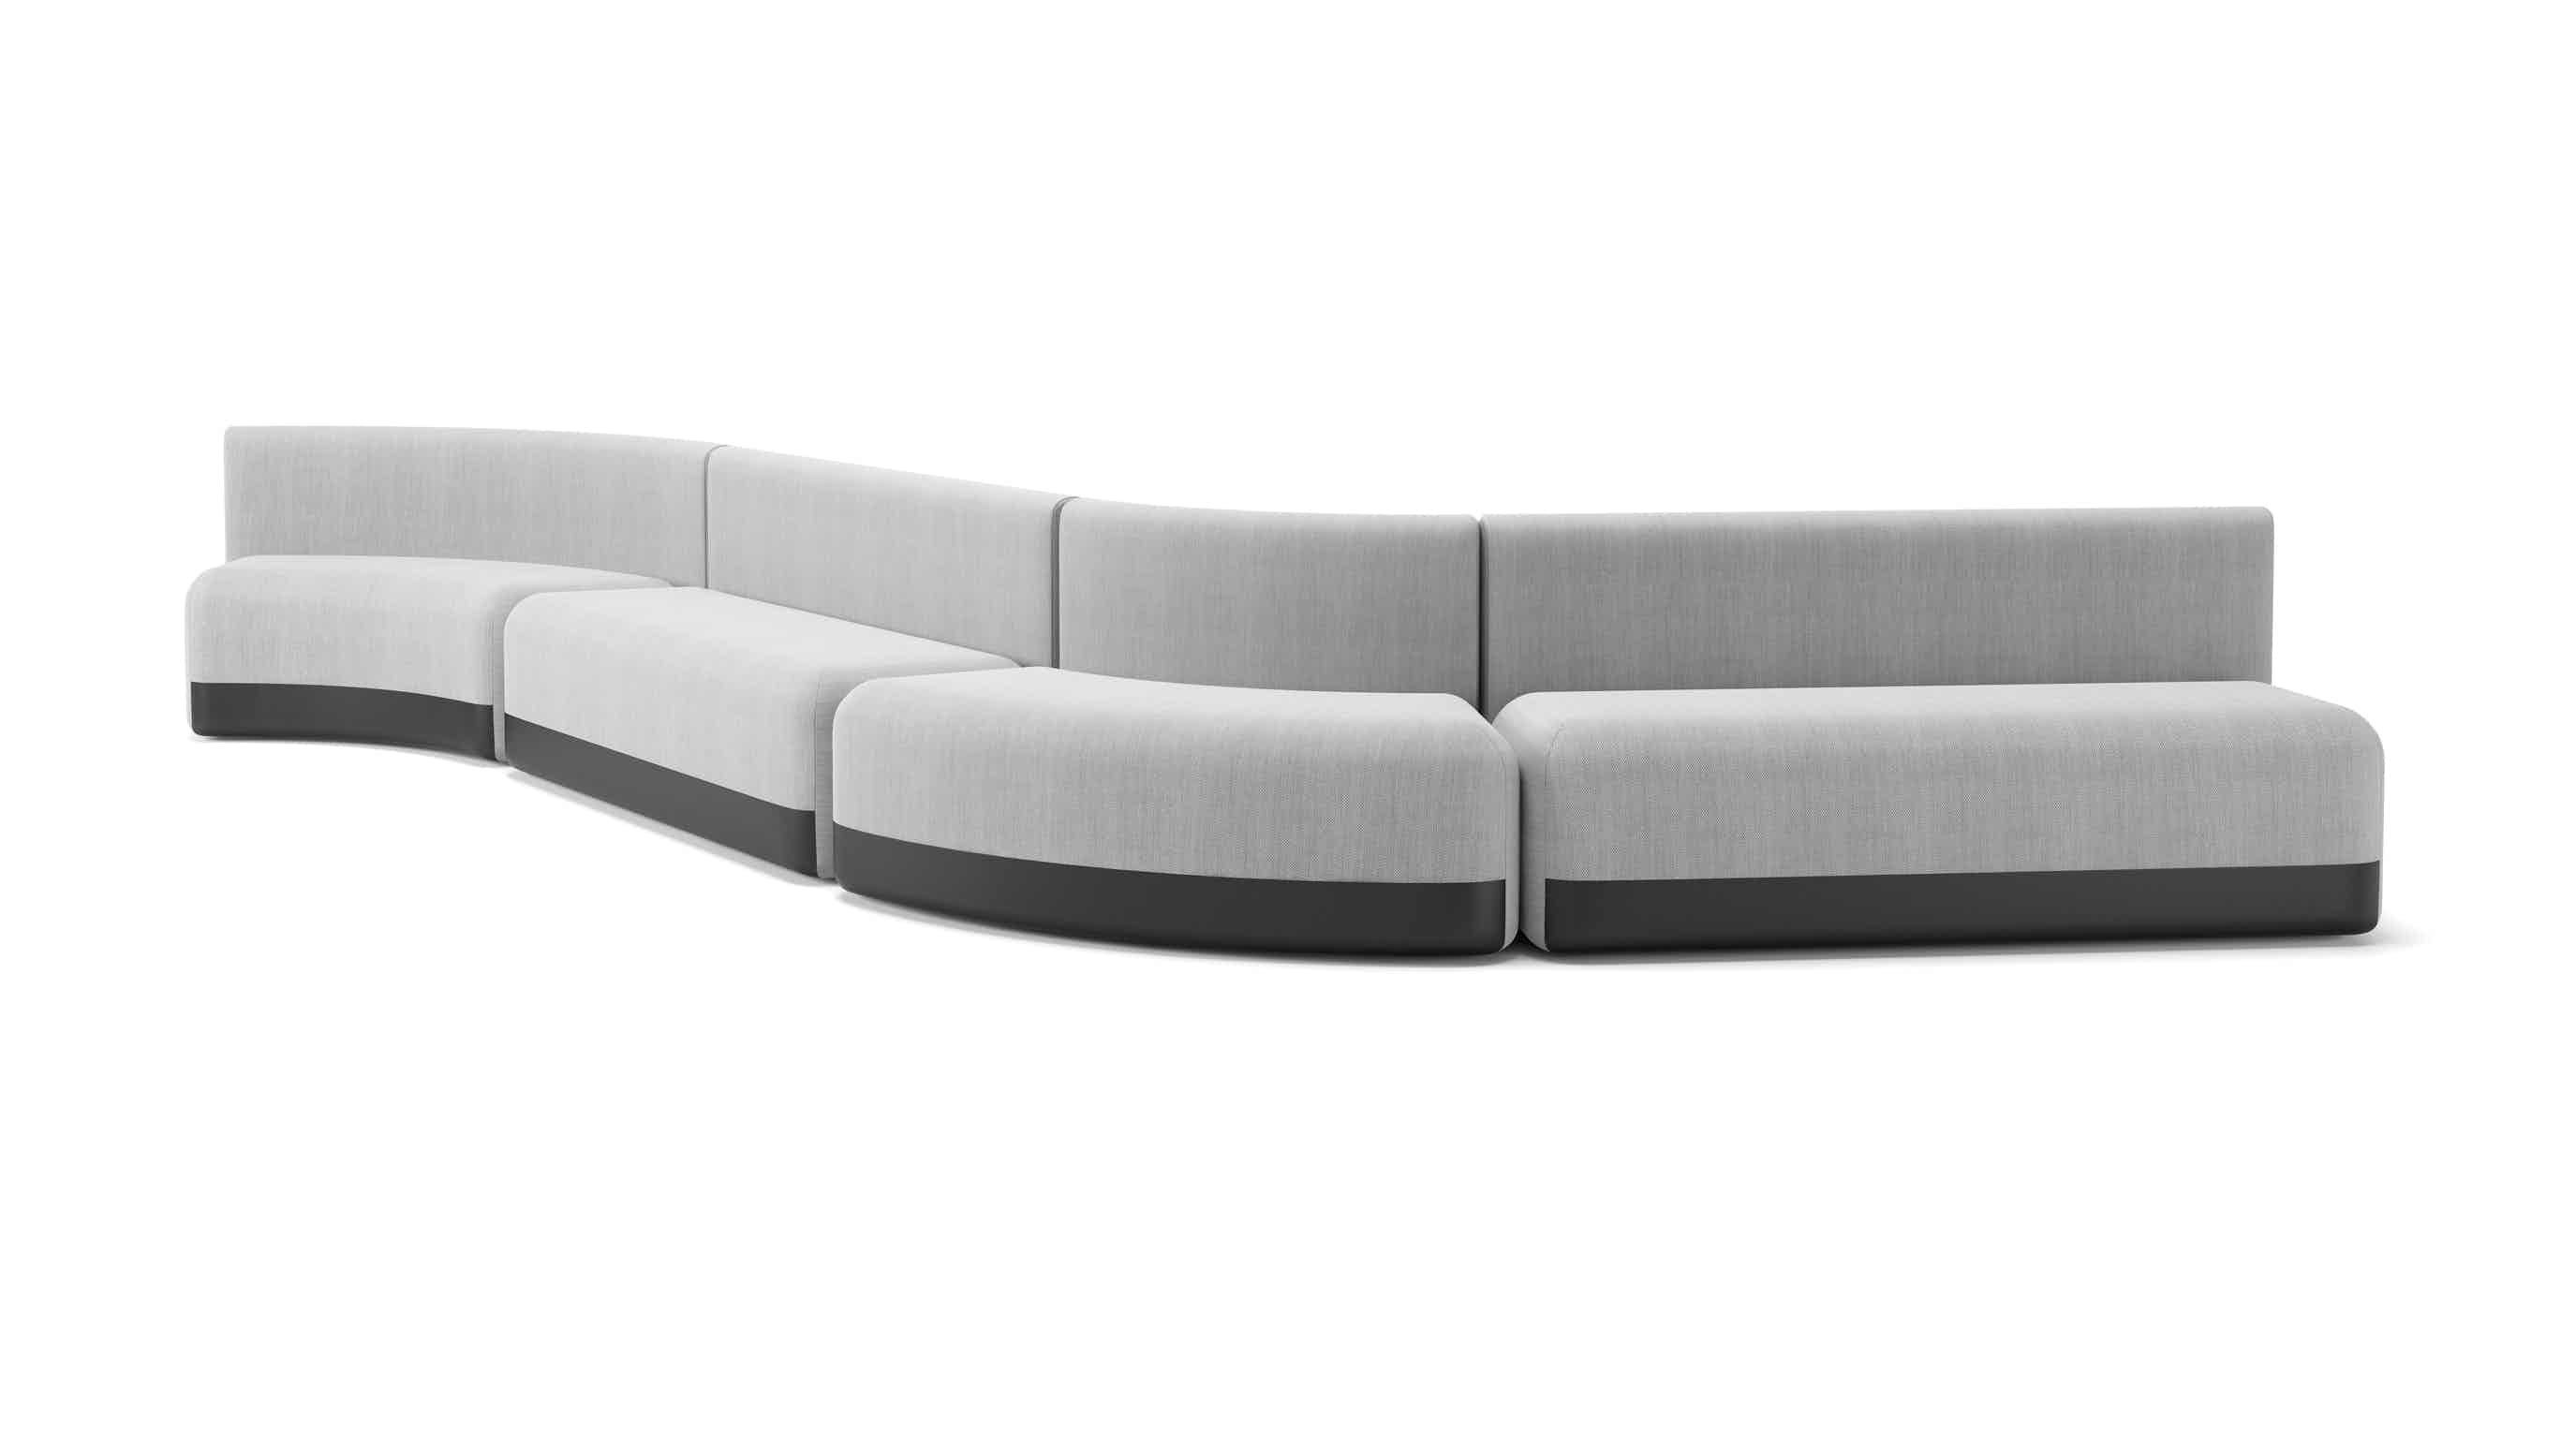 Viccarbe-grey-long-season-sofa-haute-living